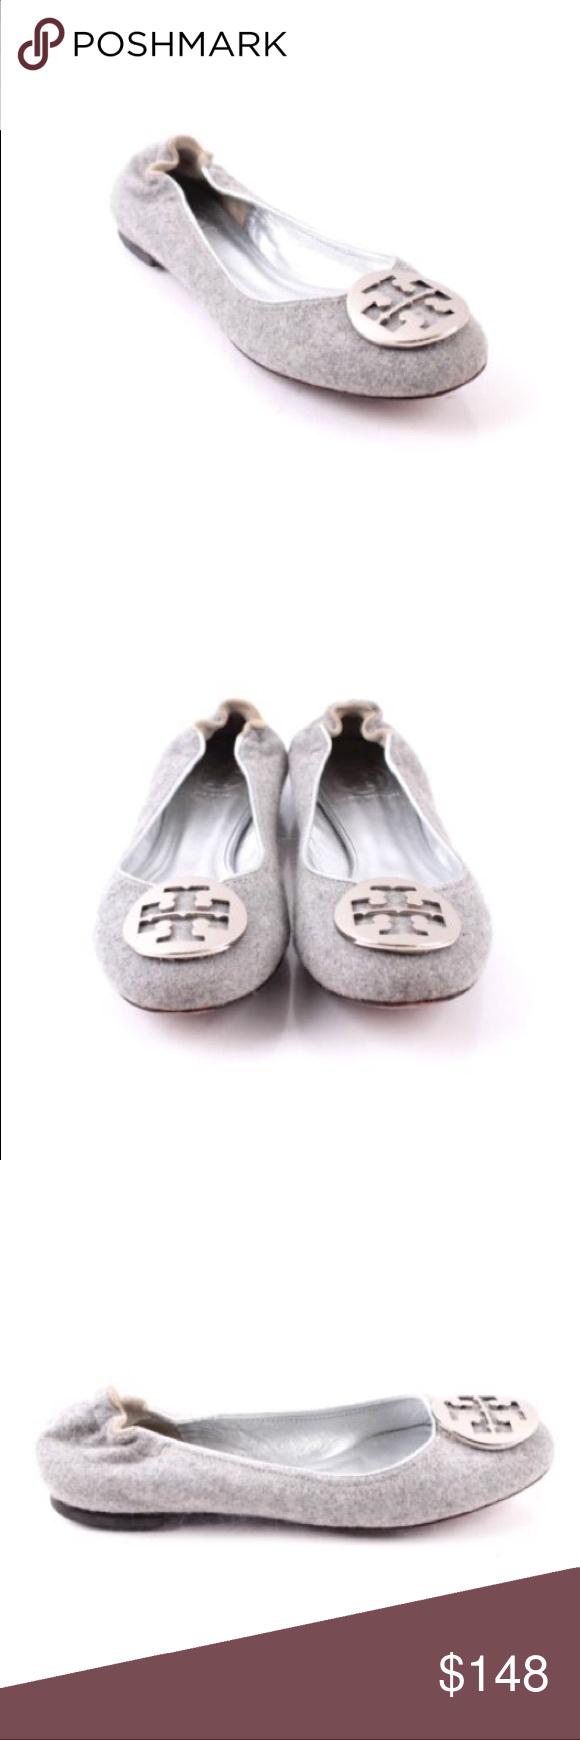 e30988d610d1 Tory Burch Gray Wool Felt T Logo Reva Ballet Flat Limited edition Tory Burch  Gray Wool Felt T Logo Reva Ballet Flat in excellent used condition.